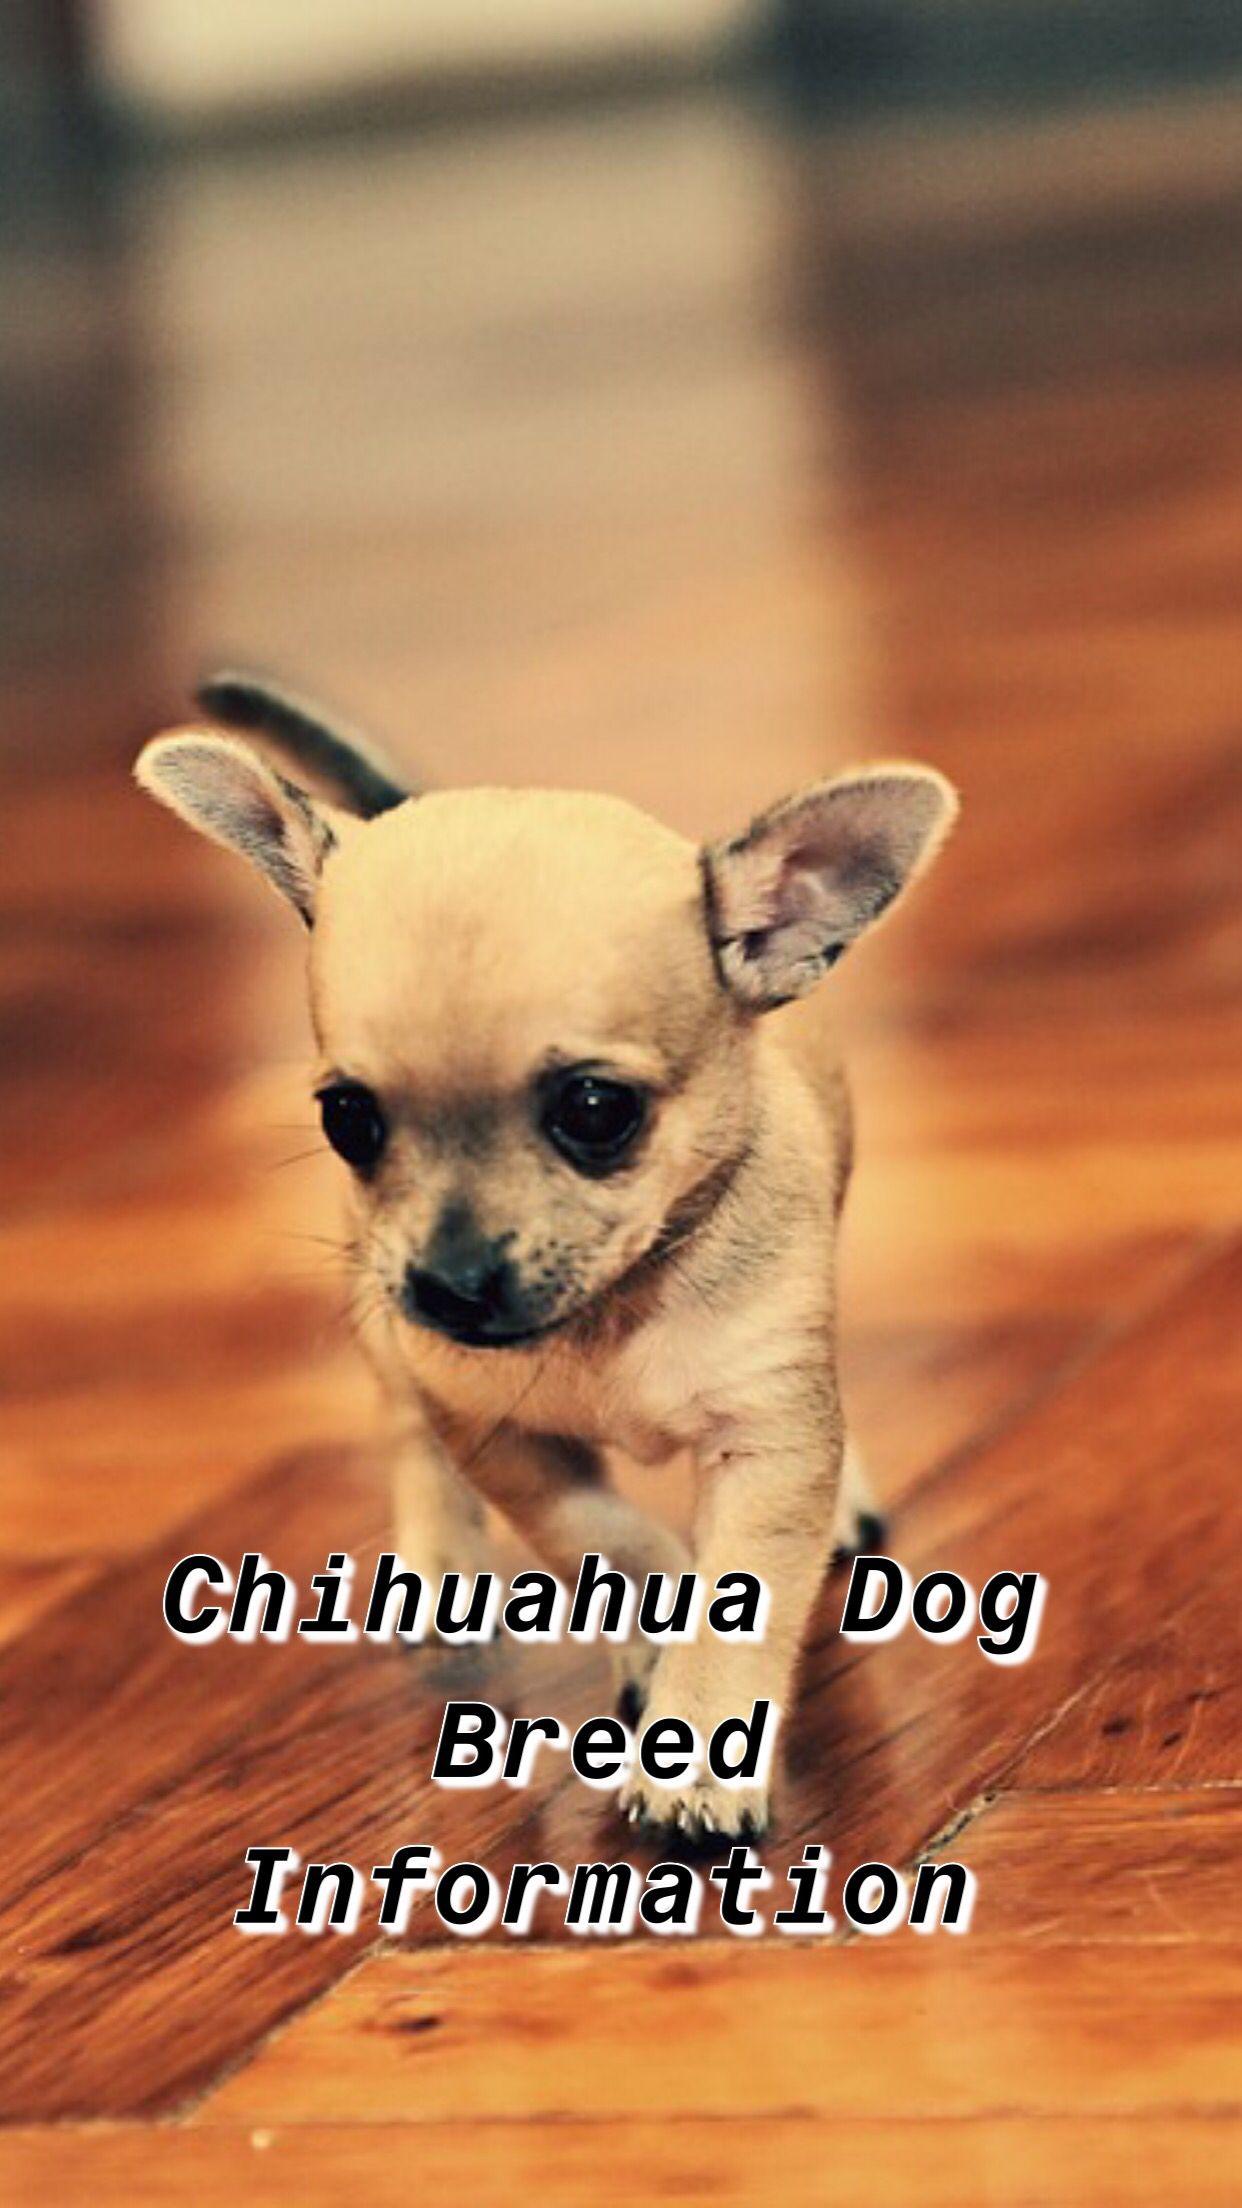 Chihuahua Dogs Chihuahua Quotes Chihuahua Funny Chihuahua Deerhead